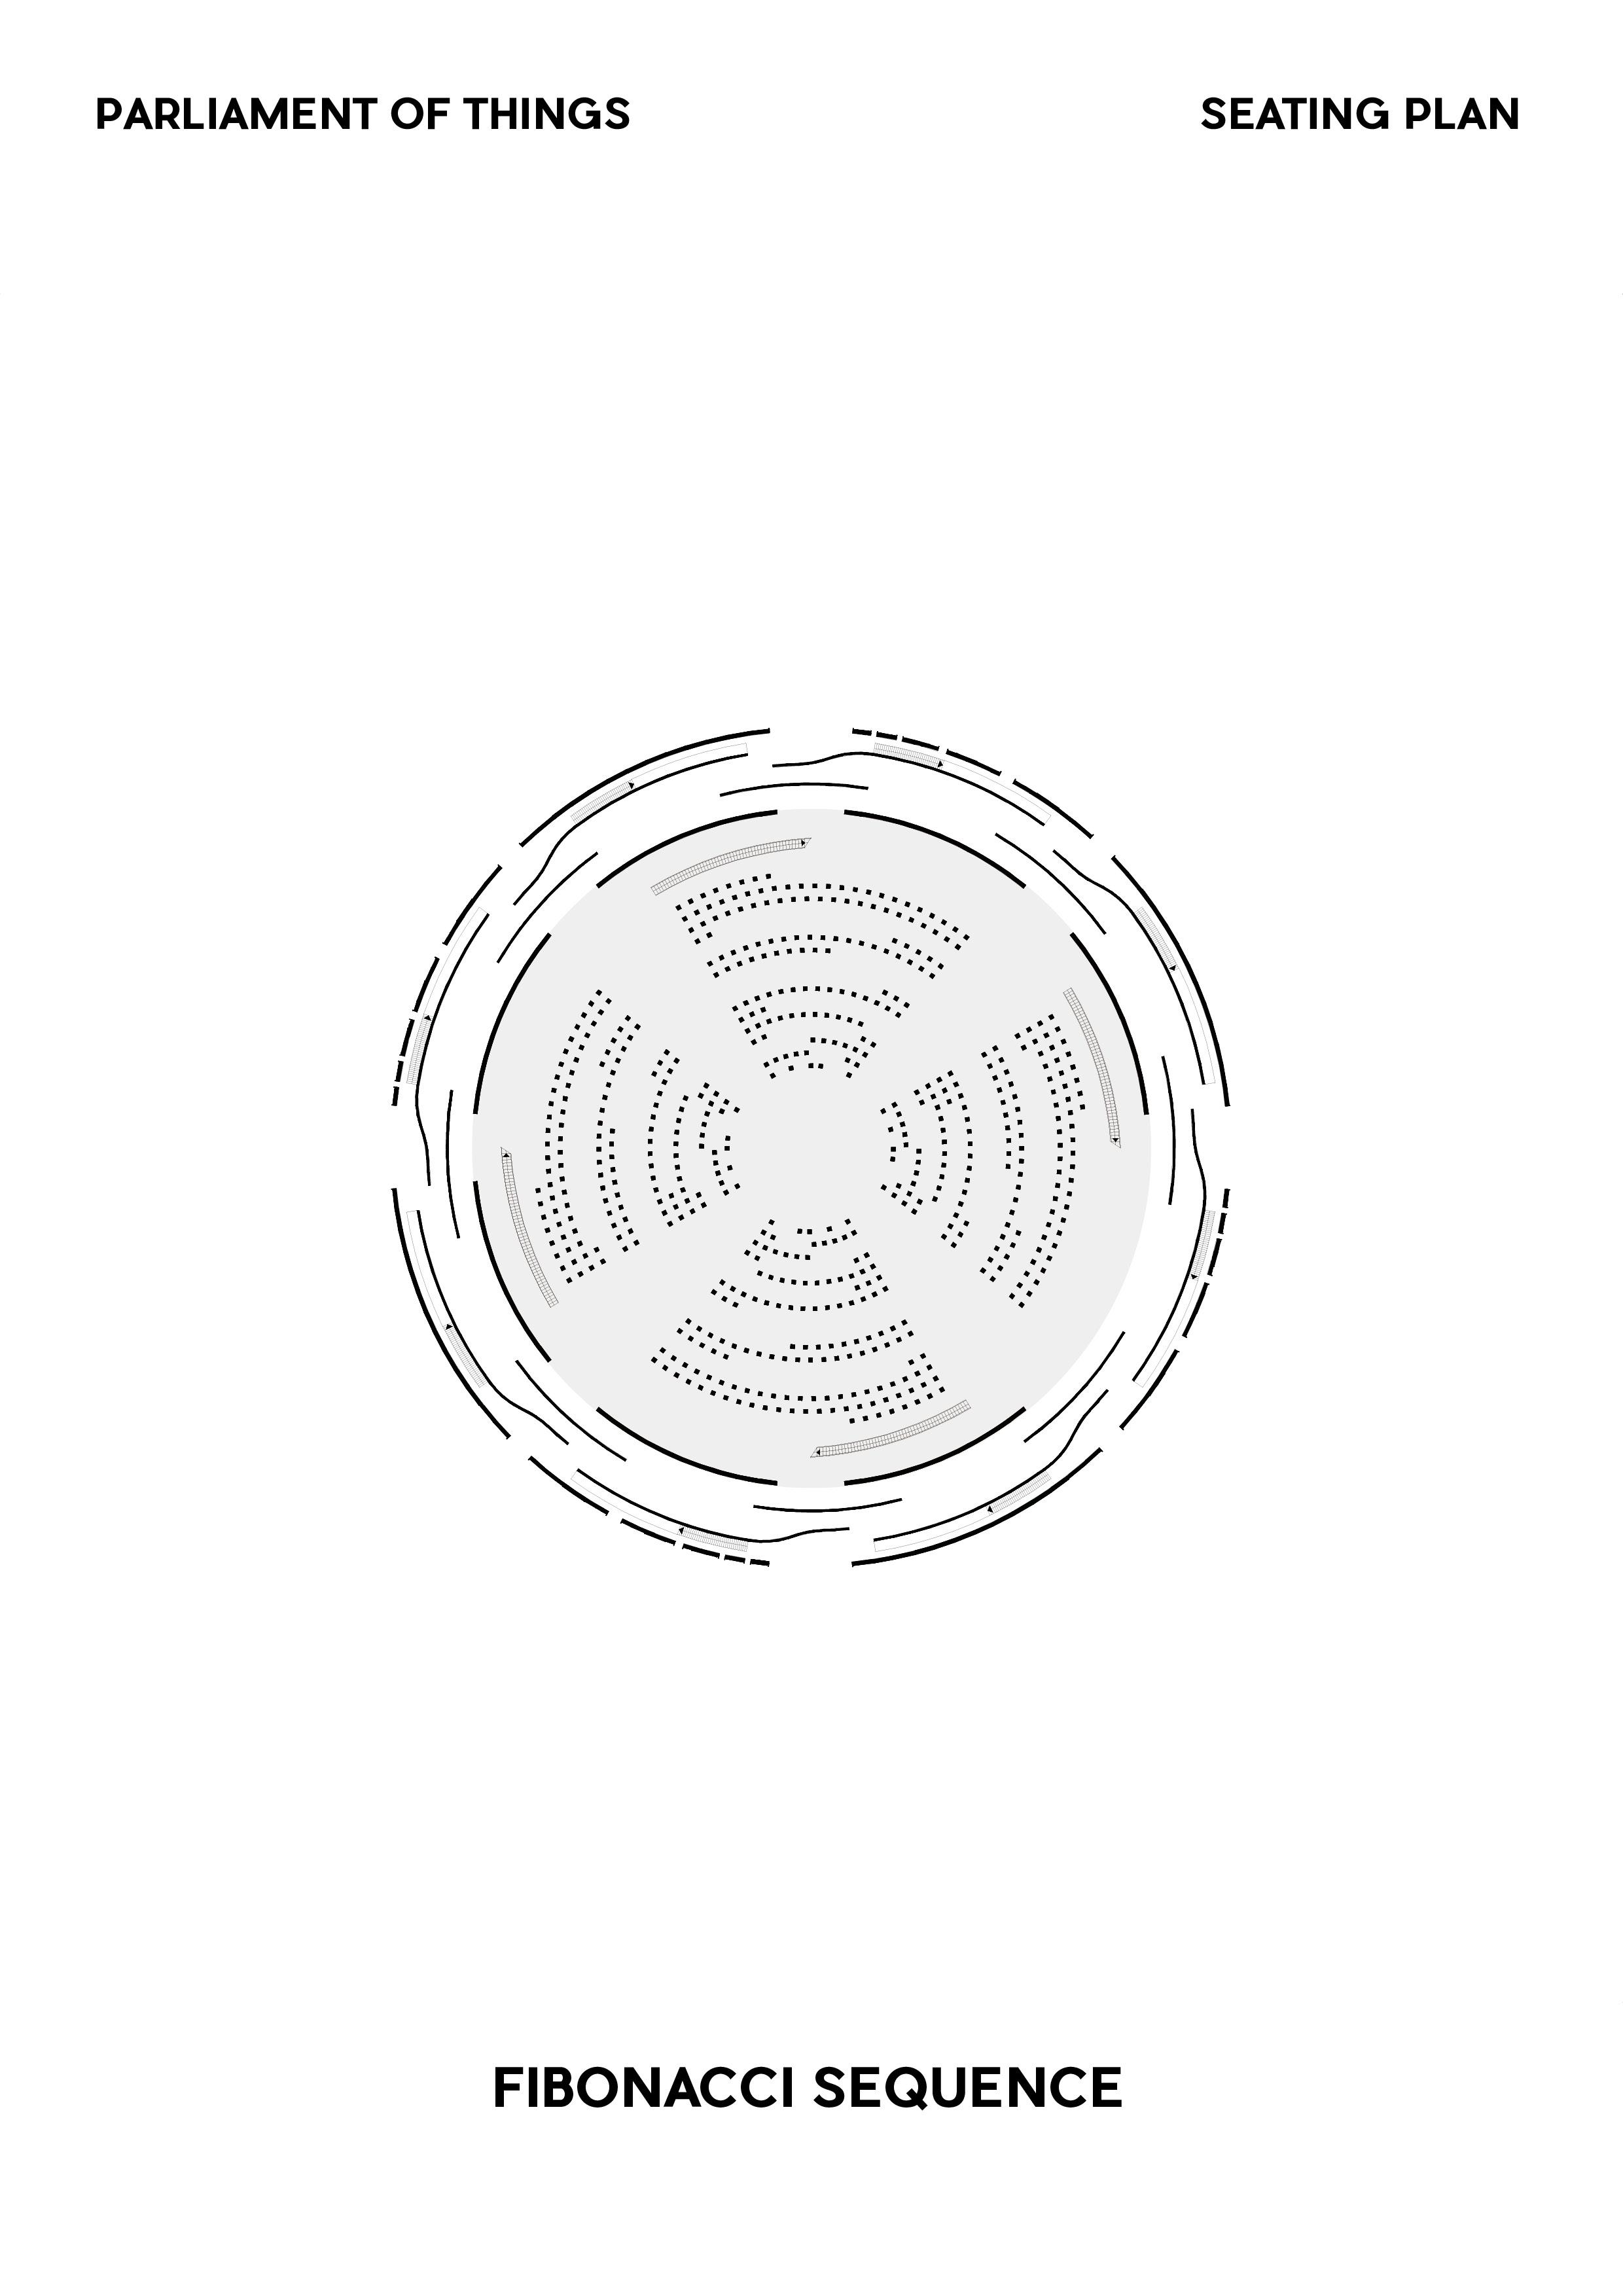 POT_seatingarrangements_4.jpg